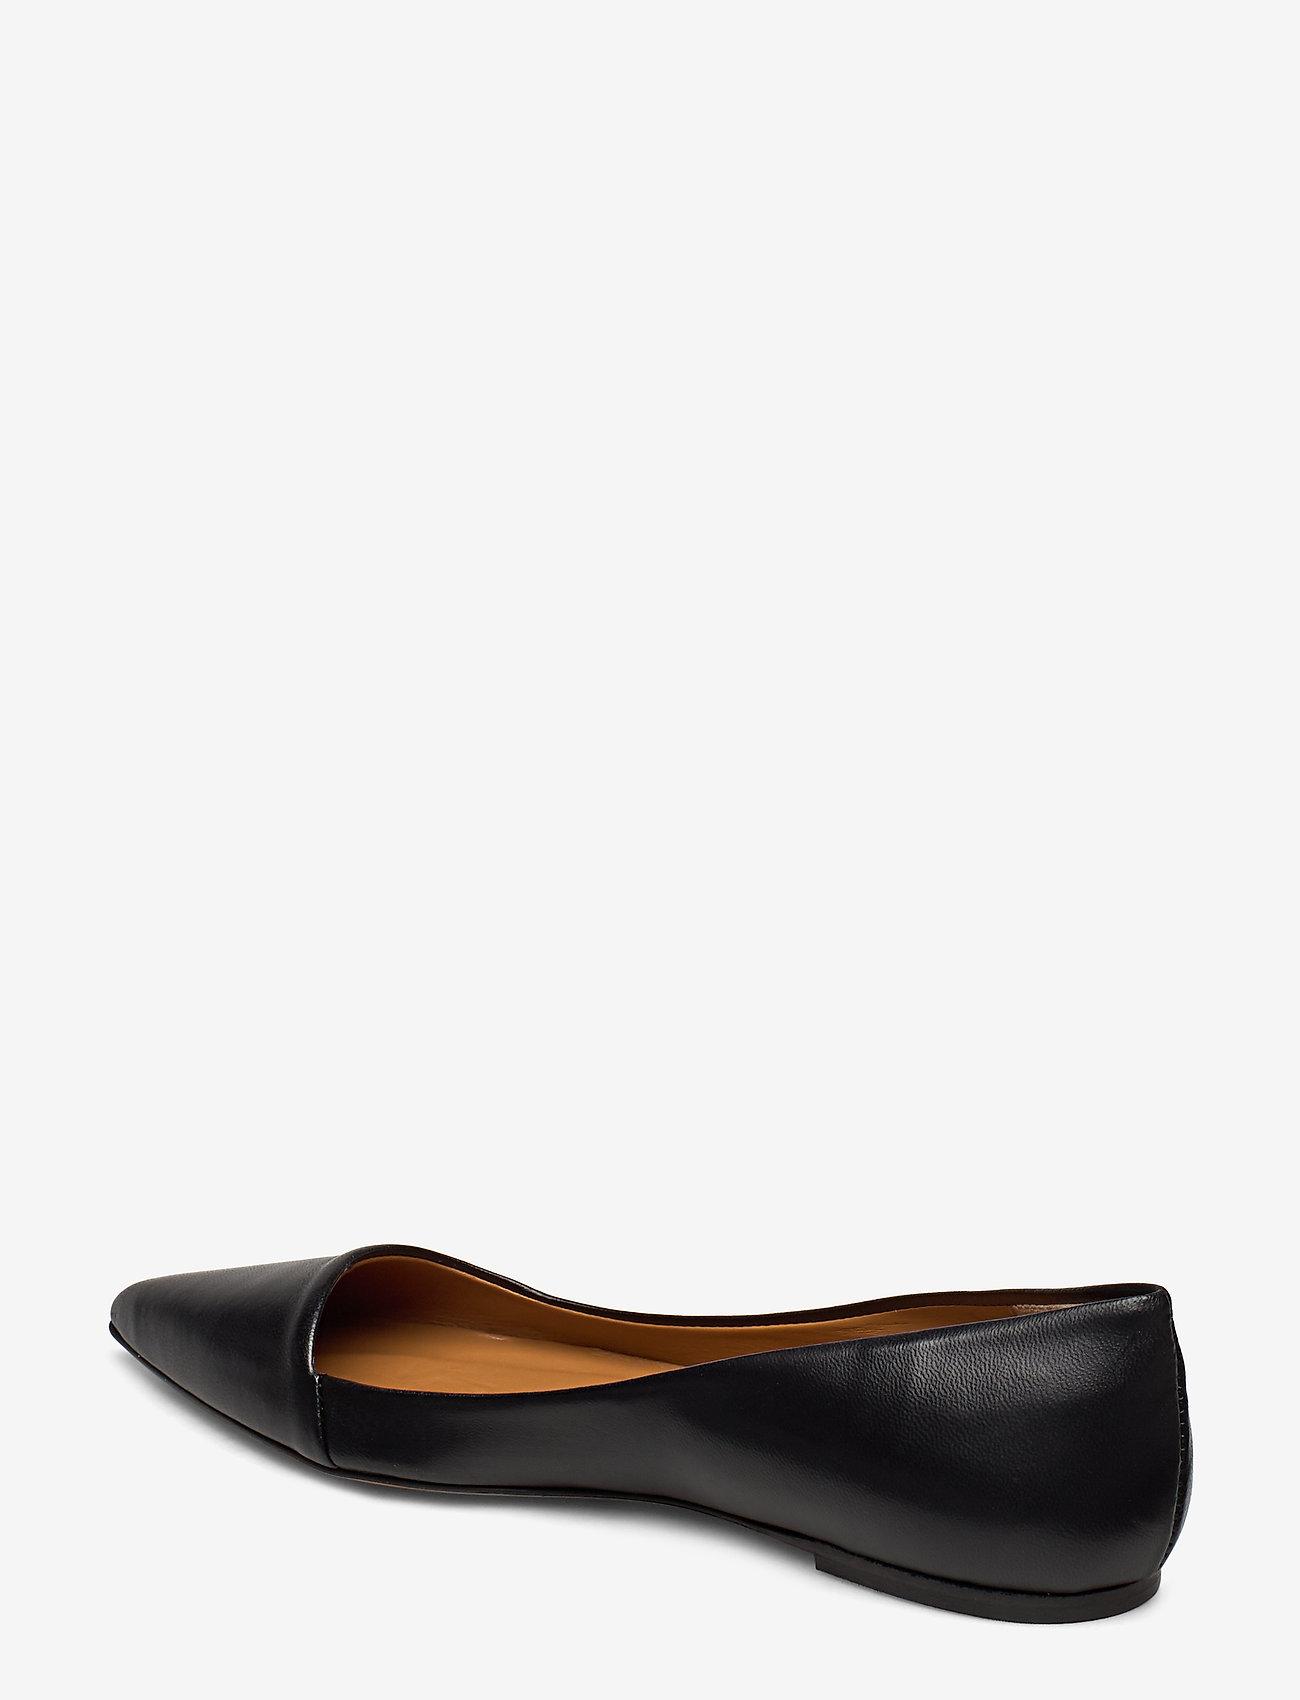 ATP Atelier - San Cataldo Black Nappa - shoes - black - 2